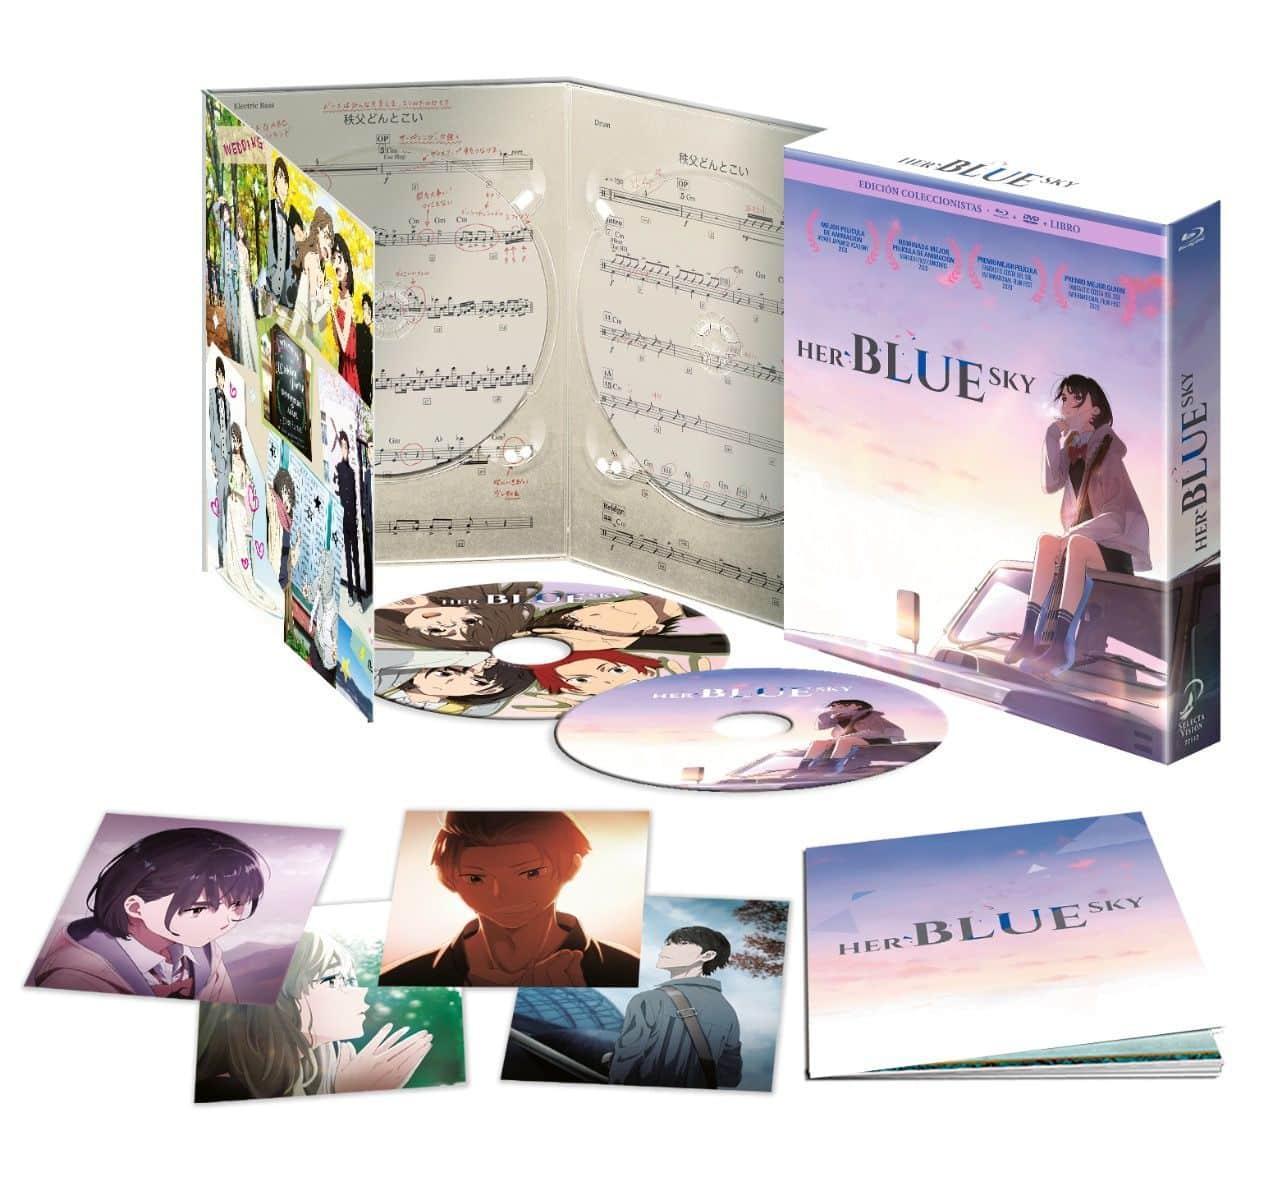 Her Blue Sky: Edición coleccionista Blue-ray